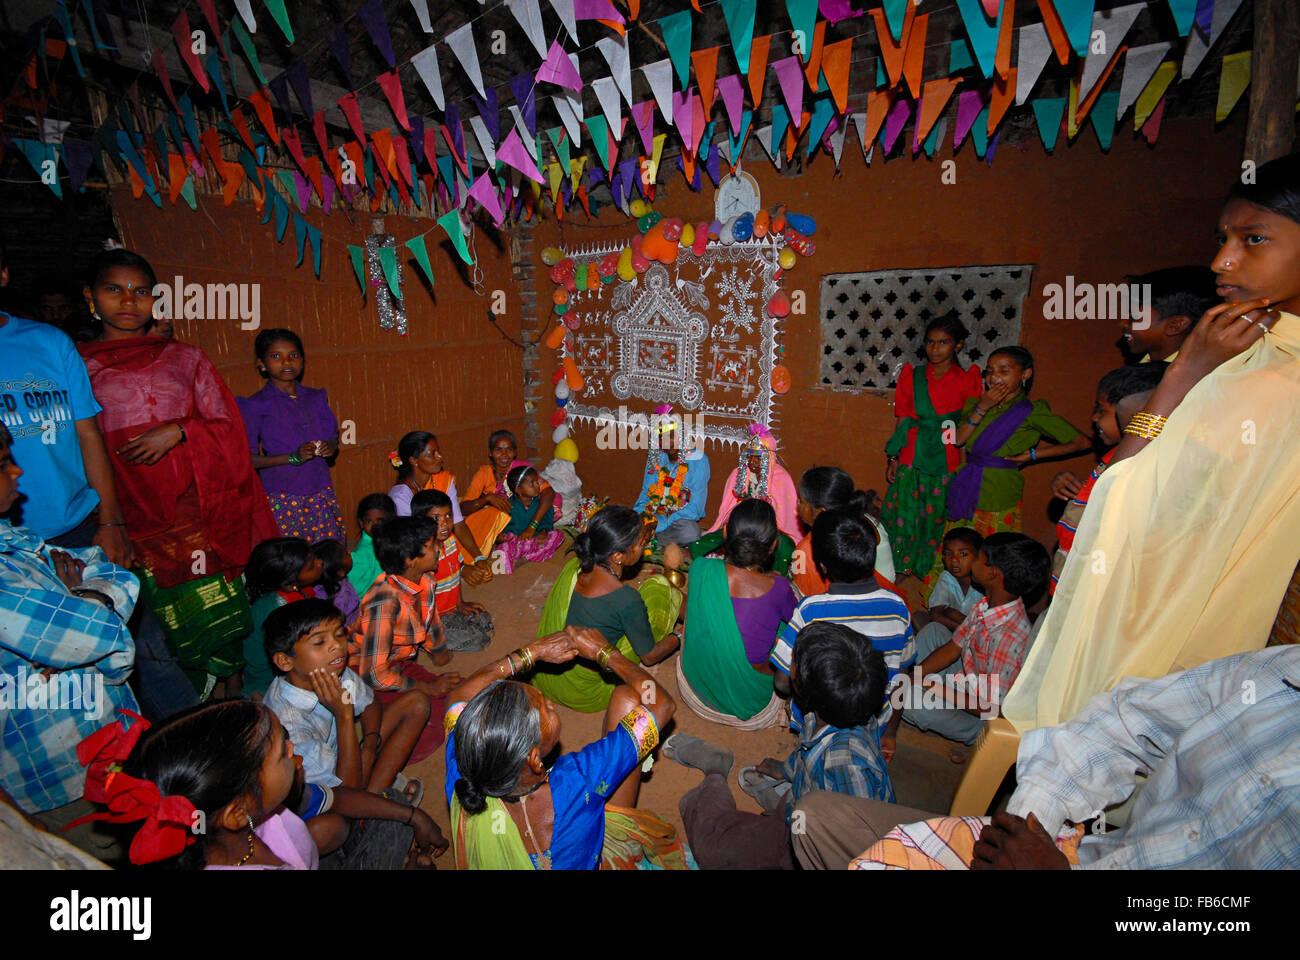 Warli tribe wedding ceremony raitali village dahanu warli tribe wedding ceremony with painting in background raitali village dahanu maharashtra thecheapjerseys Gallery